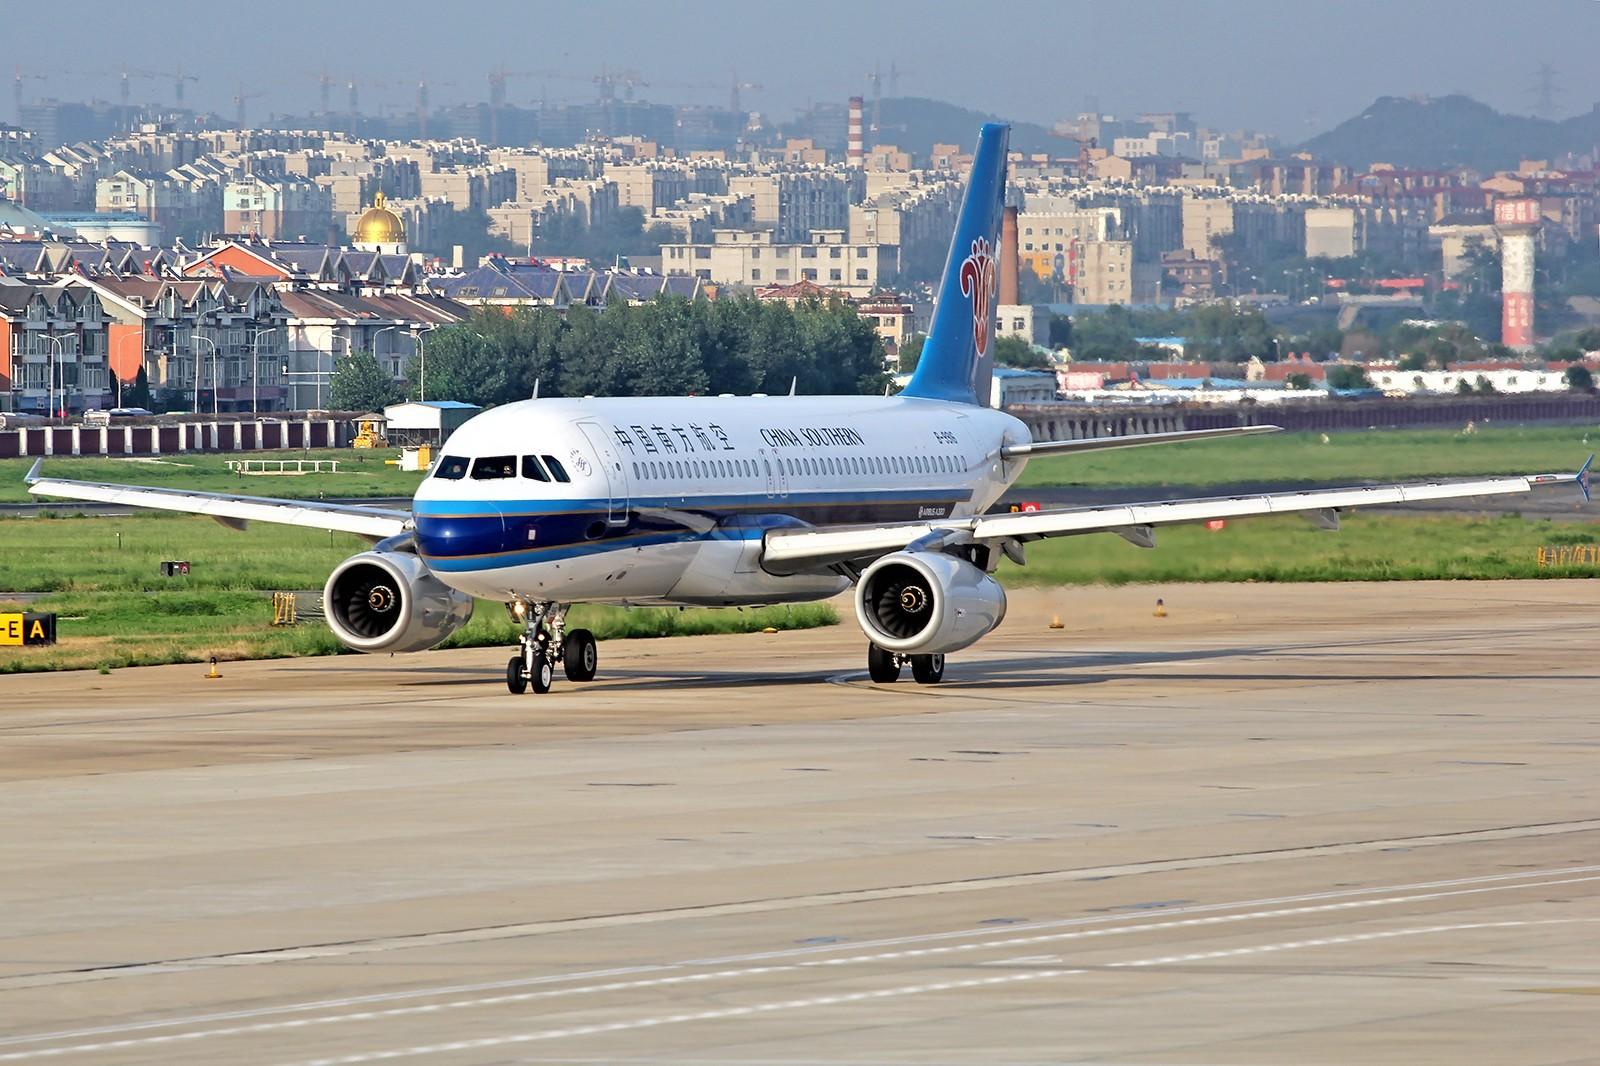 Re:[原创][DLC]。。。夕阳西下。。。 AIRBUS A320-200 B-9916 中国大连周水子国际机场